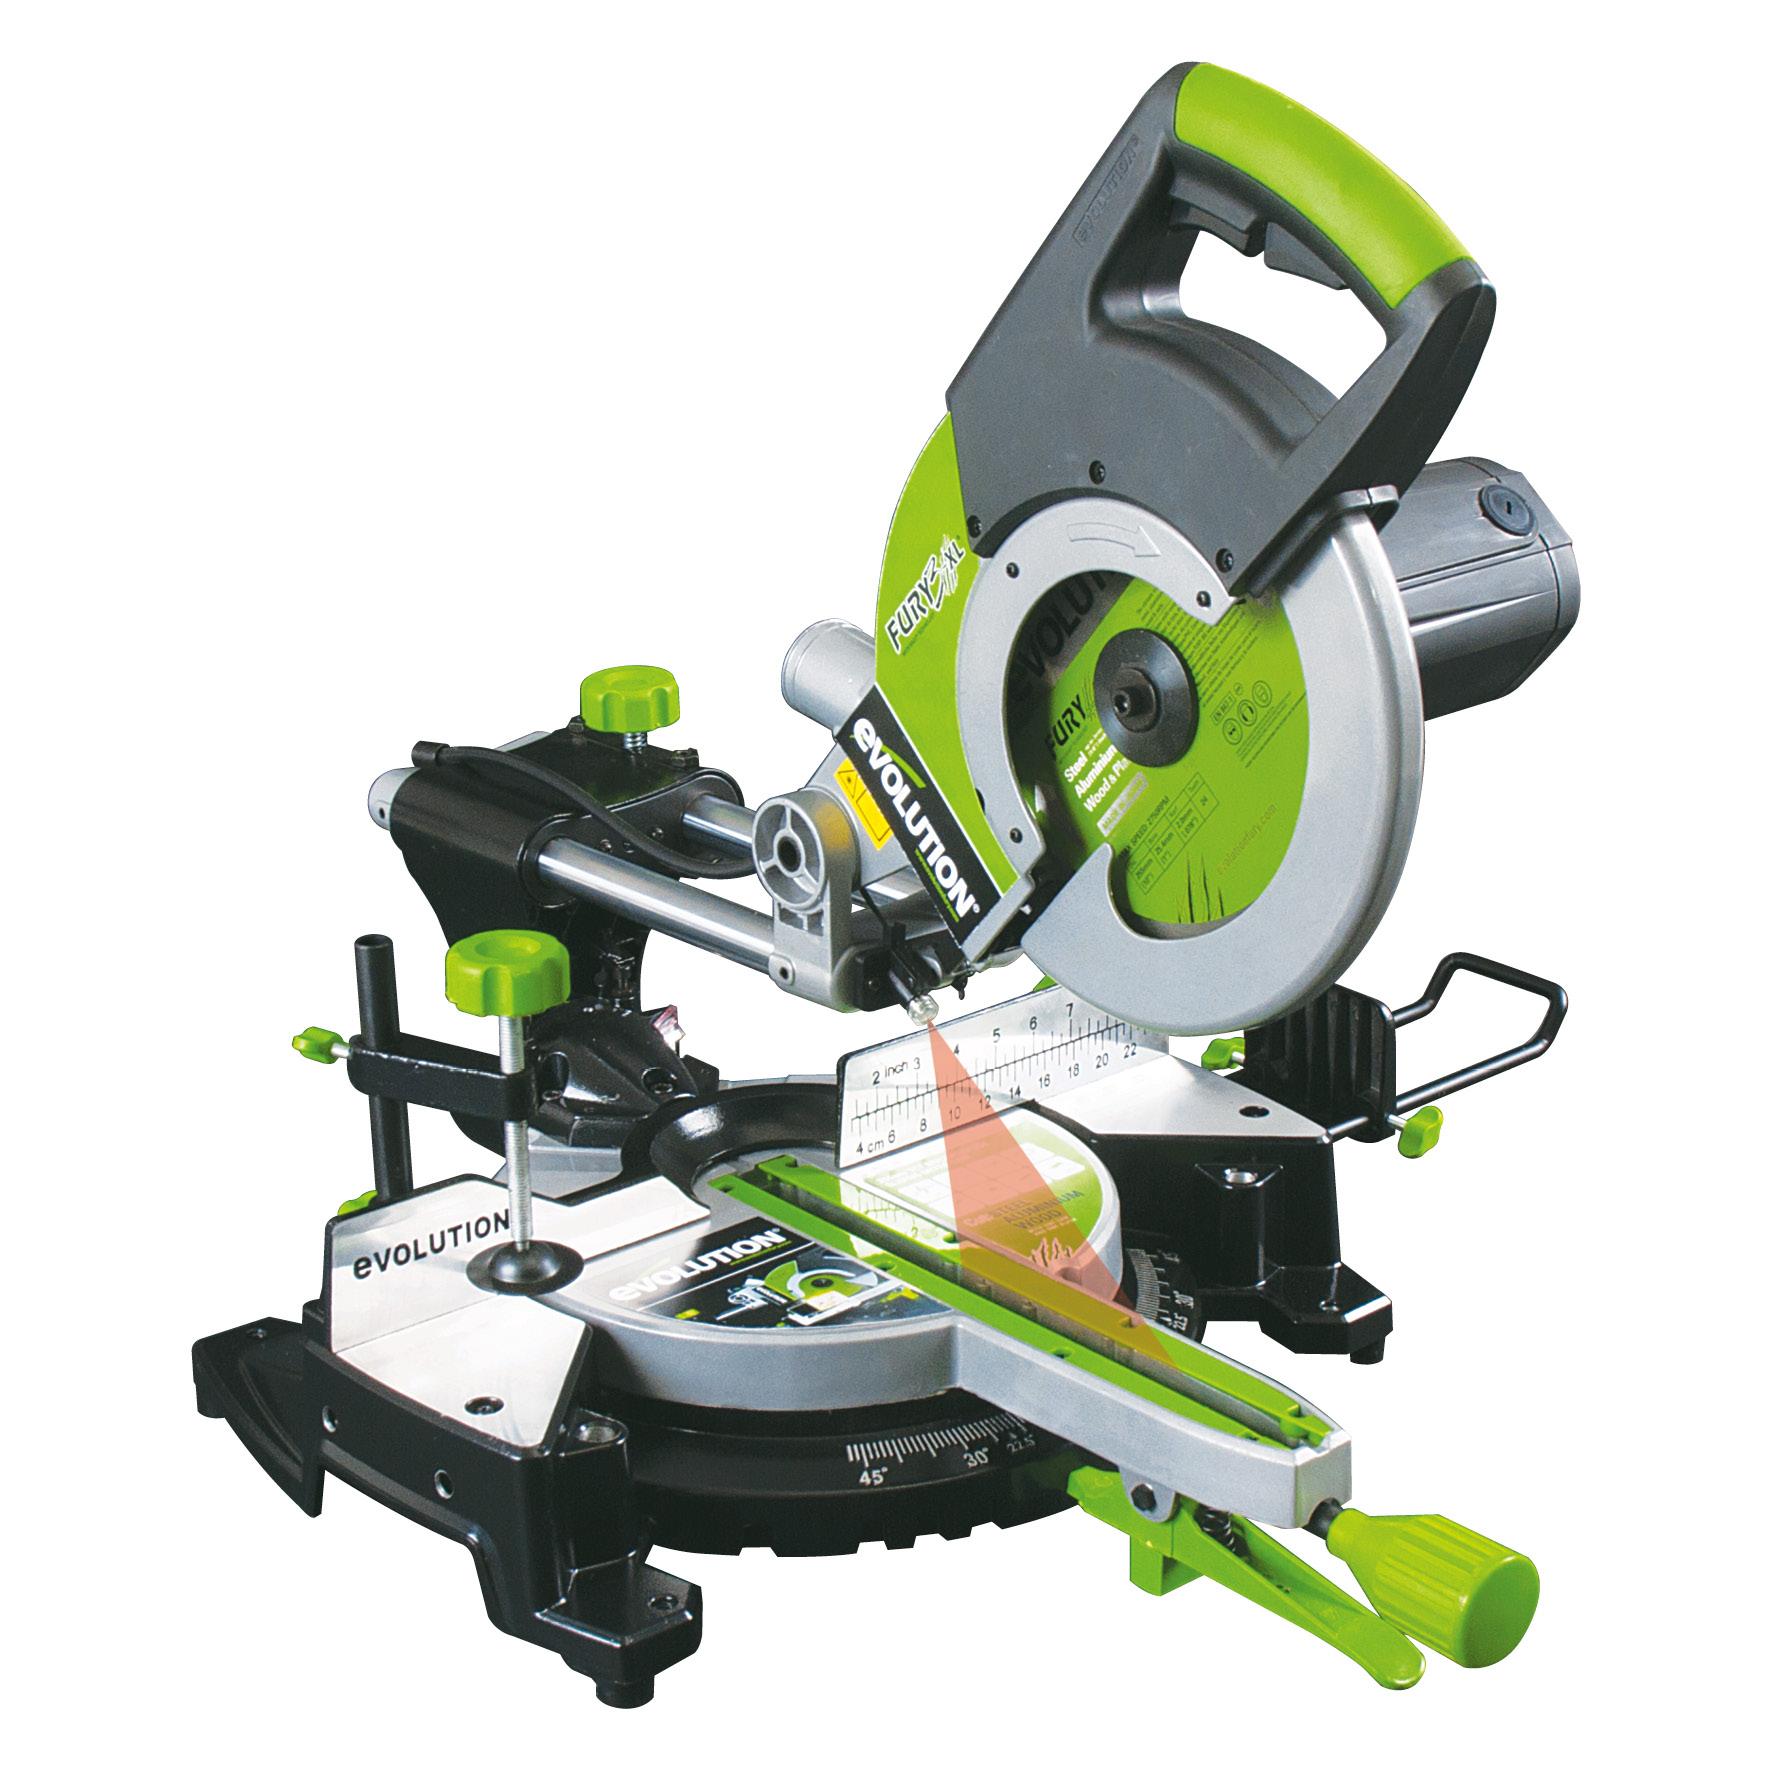 evolution power tools ltd produits de la categorie scie. Black Bedroom Furniture Sets. Home Design Ideas